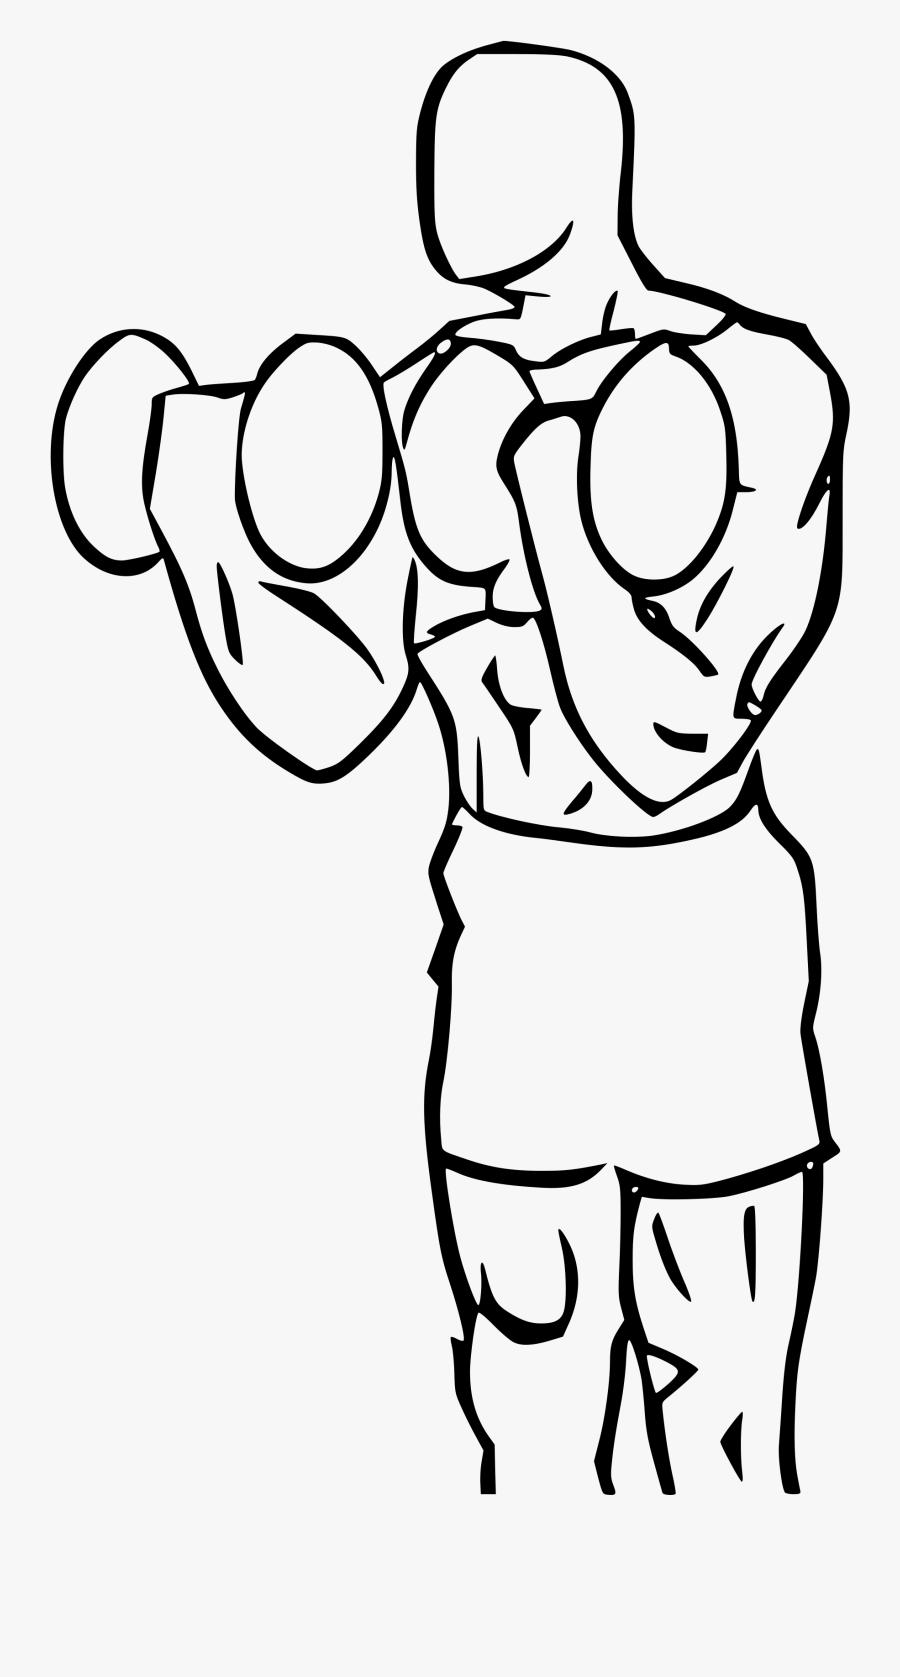 Biceps Drawing Cartoon Clip Art Royalty Free Download - Bicep Curl Squat Drawing, Transparent Clipart